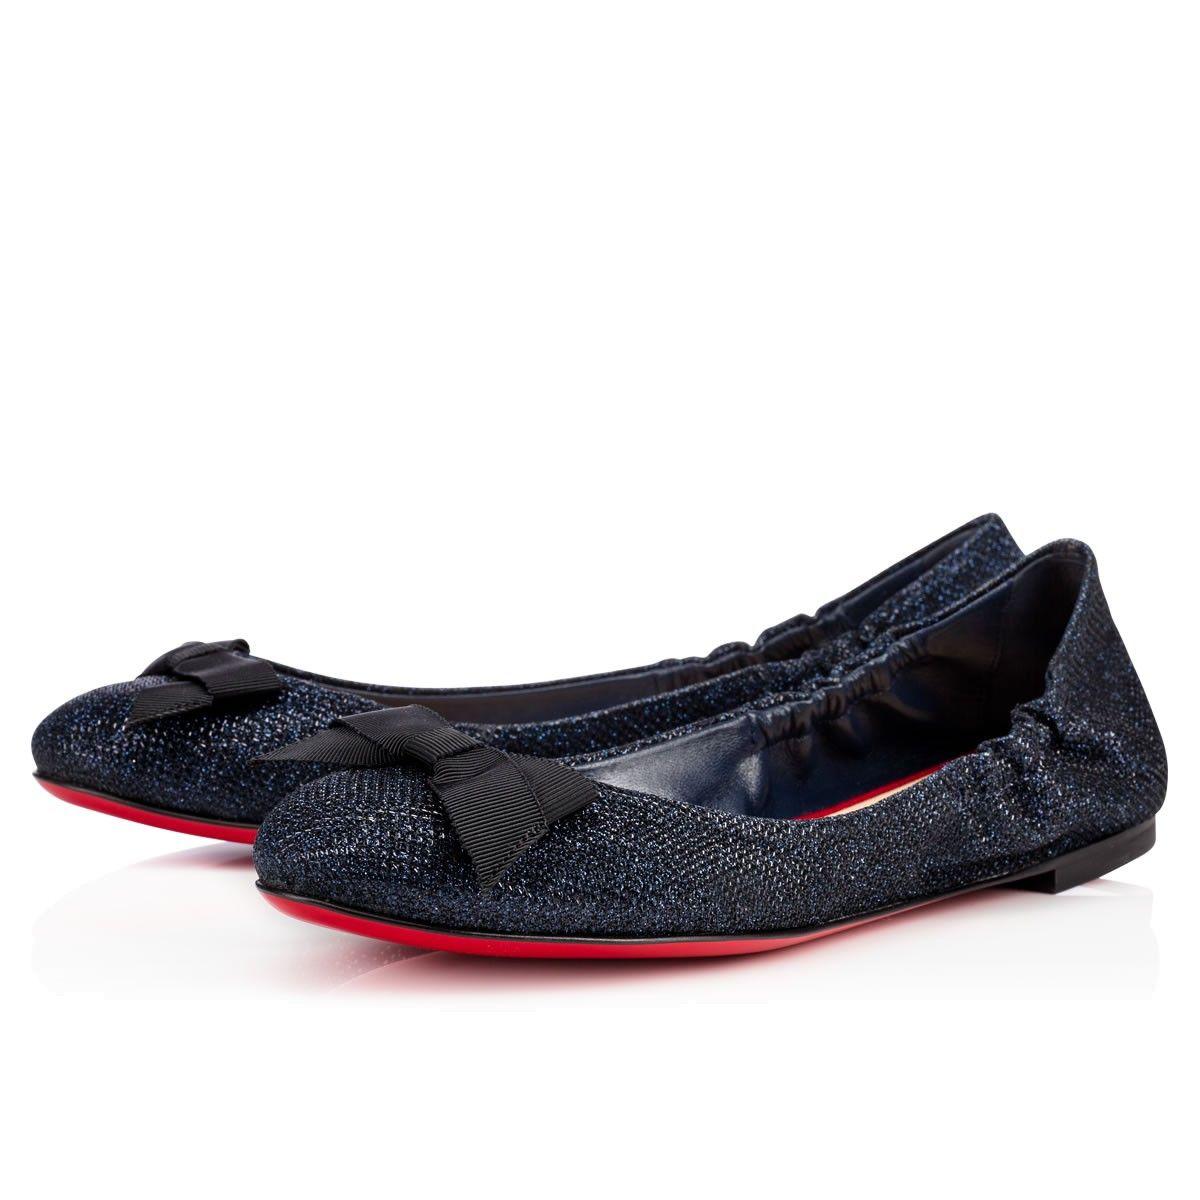 code promo 5567f cf5af Chaussures femme - Gloriana Flat Glitter Luminor - Christian ...